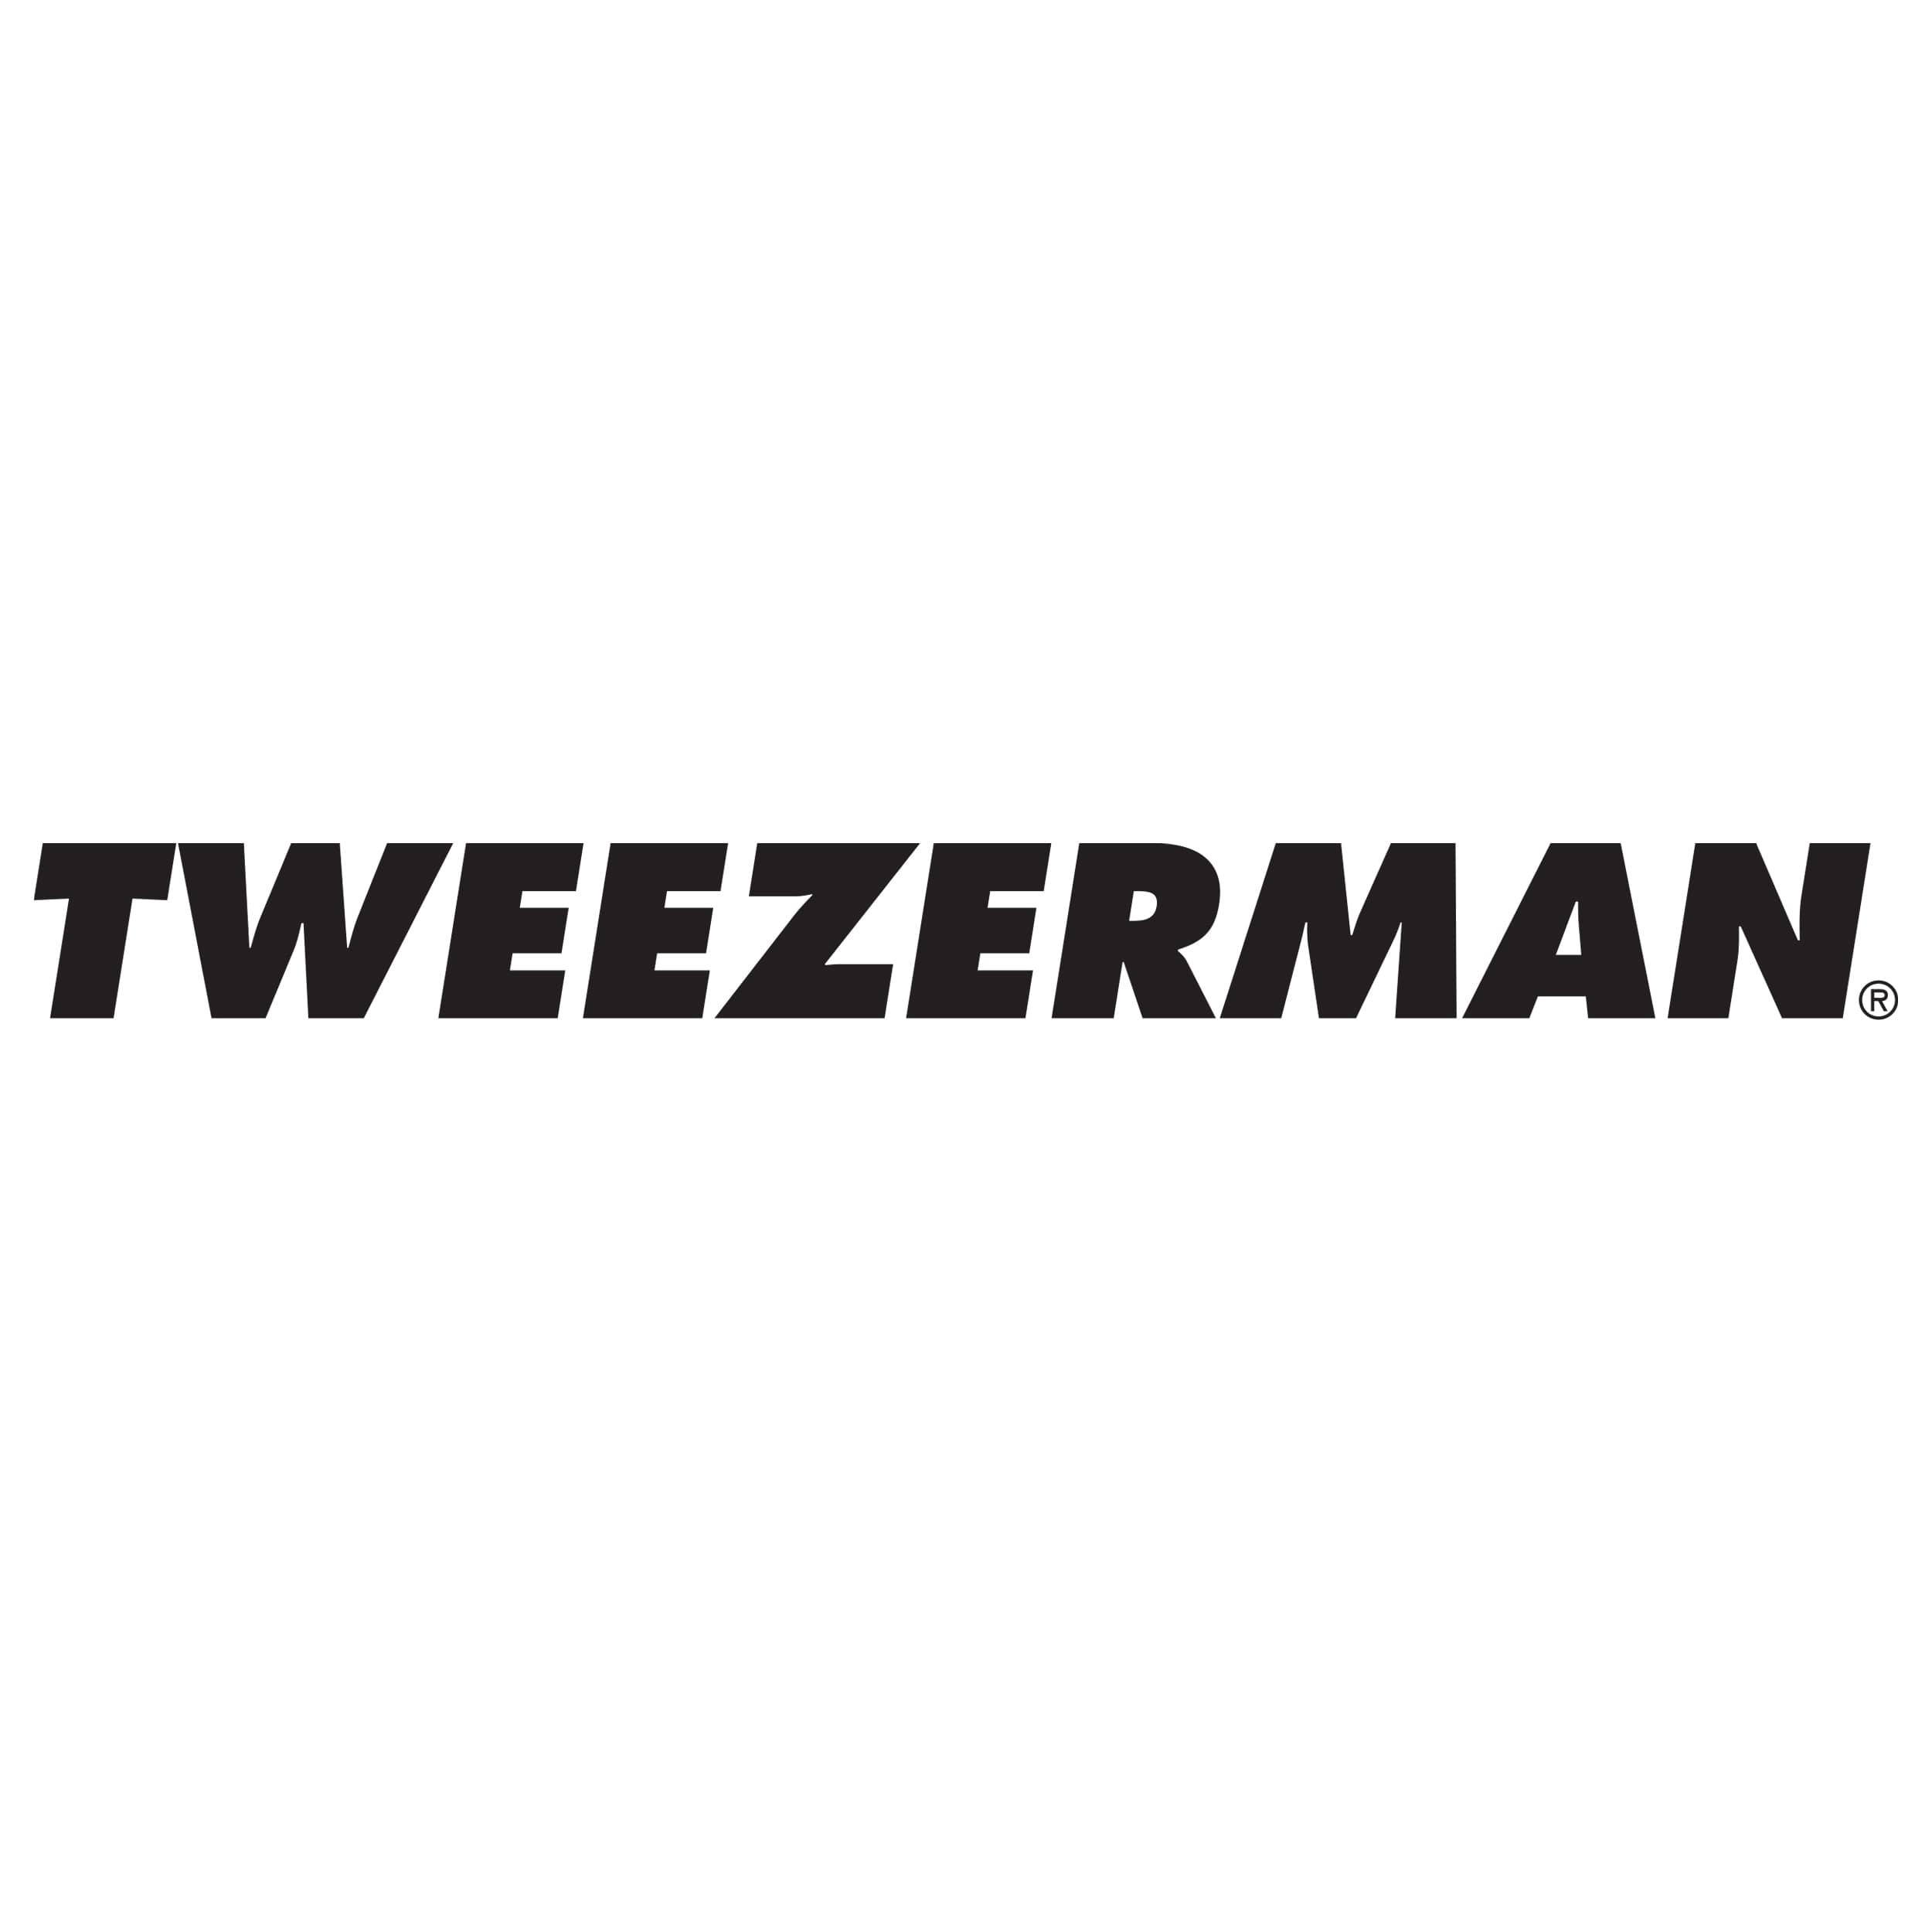 Tweezerman x Tom Bachik Ultimate Nail Care Set